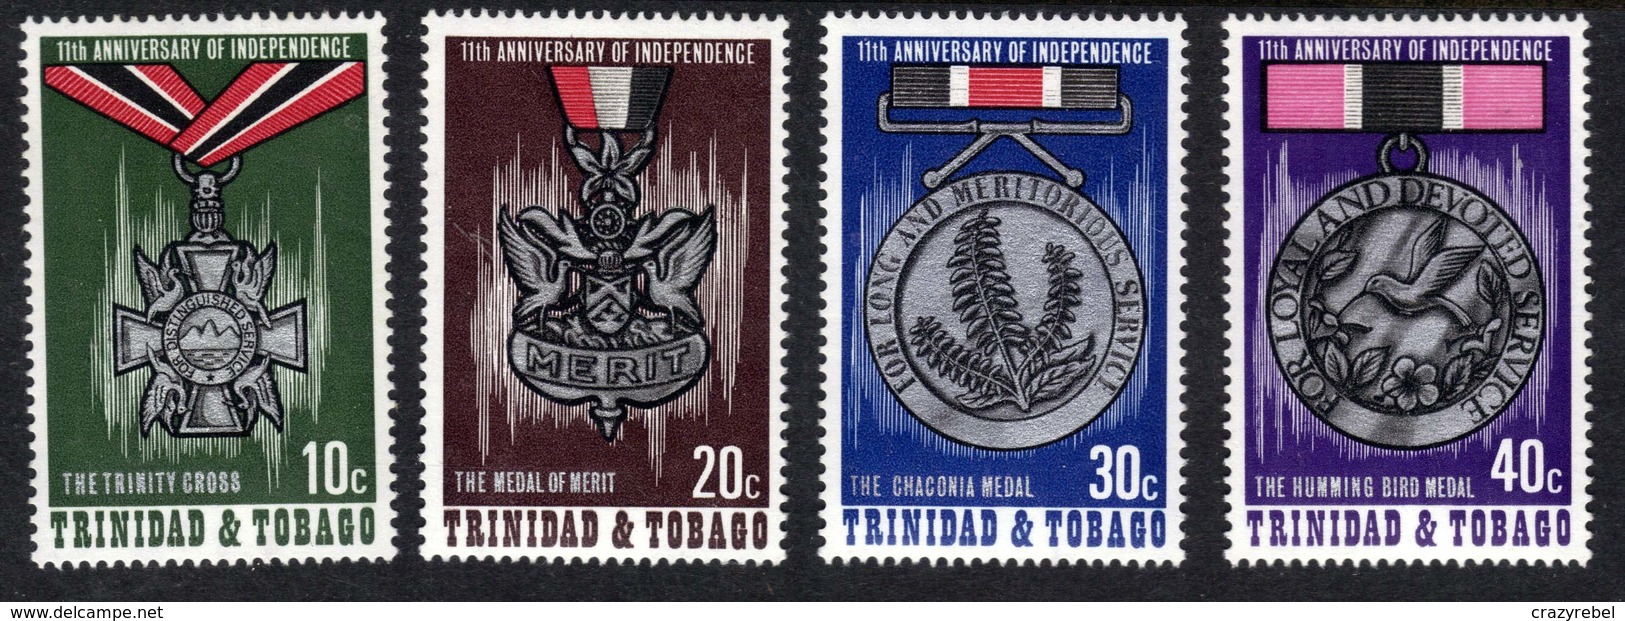 Trinidad & Tobago 1973 QE2 Anniv Independence Medals Umm SG 440 - 443( J1449 ) - Trinidad & Tobago (1962-...)